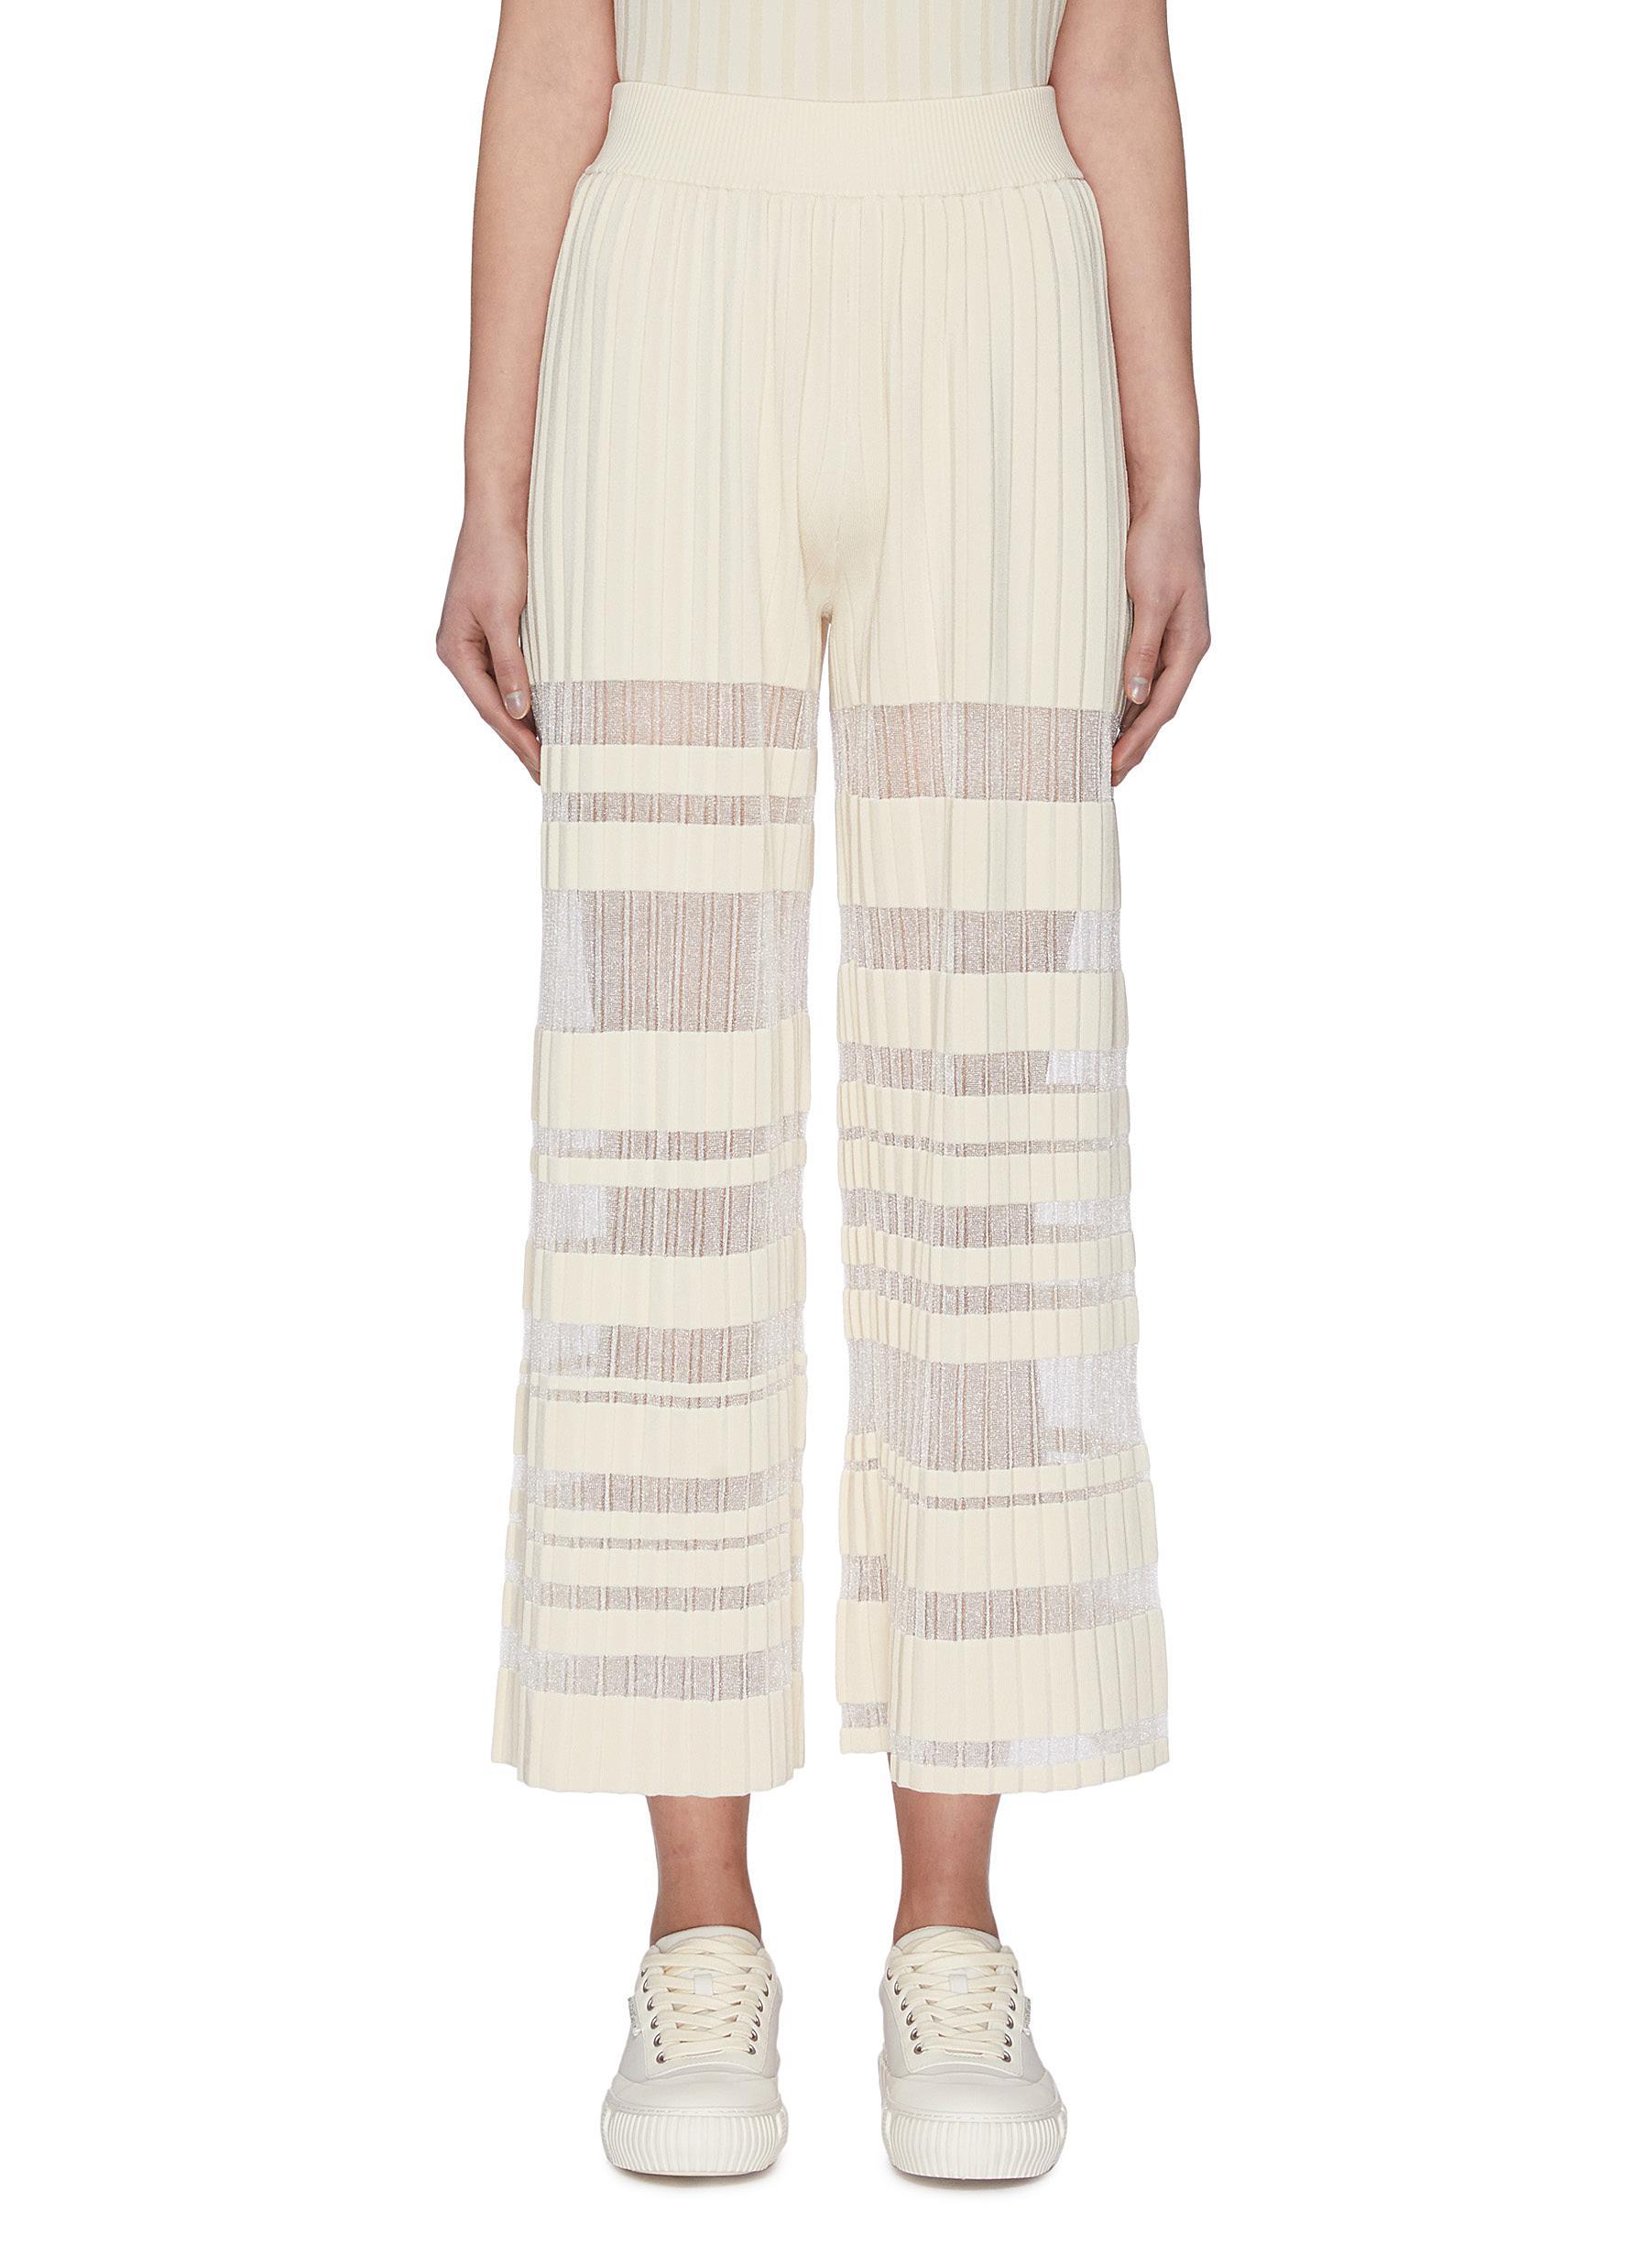 Buy Ph5 Pants & Shorts 'UV-Reactive' Pleated Pants